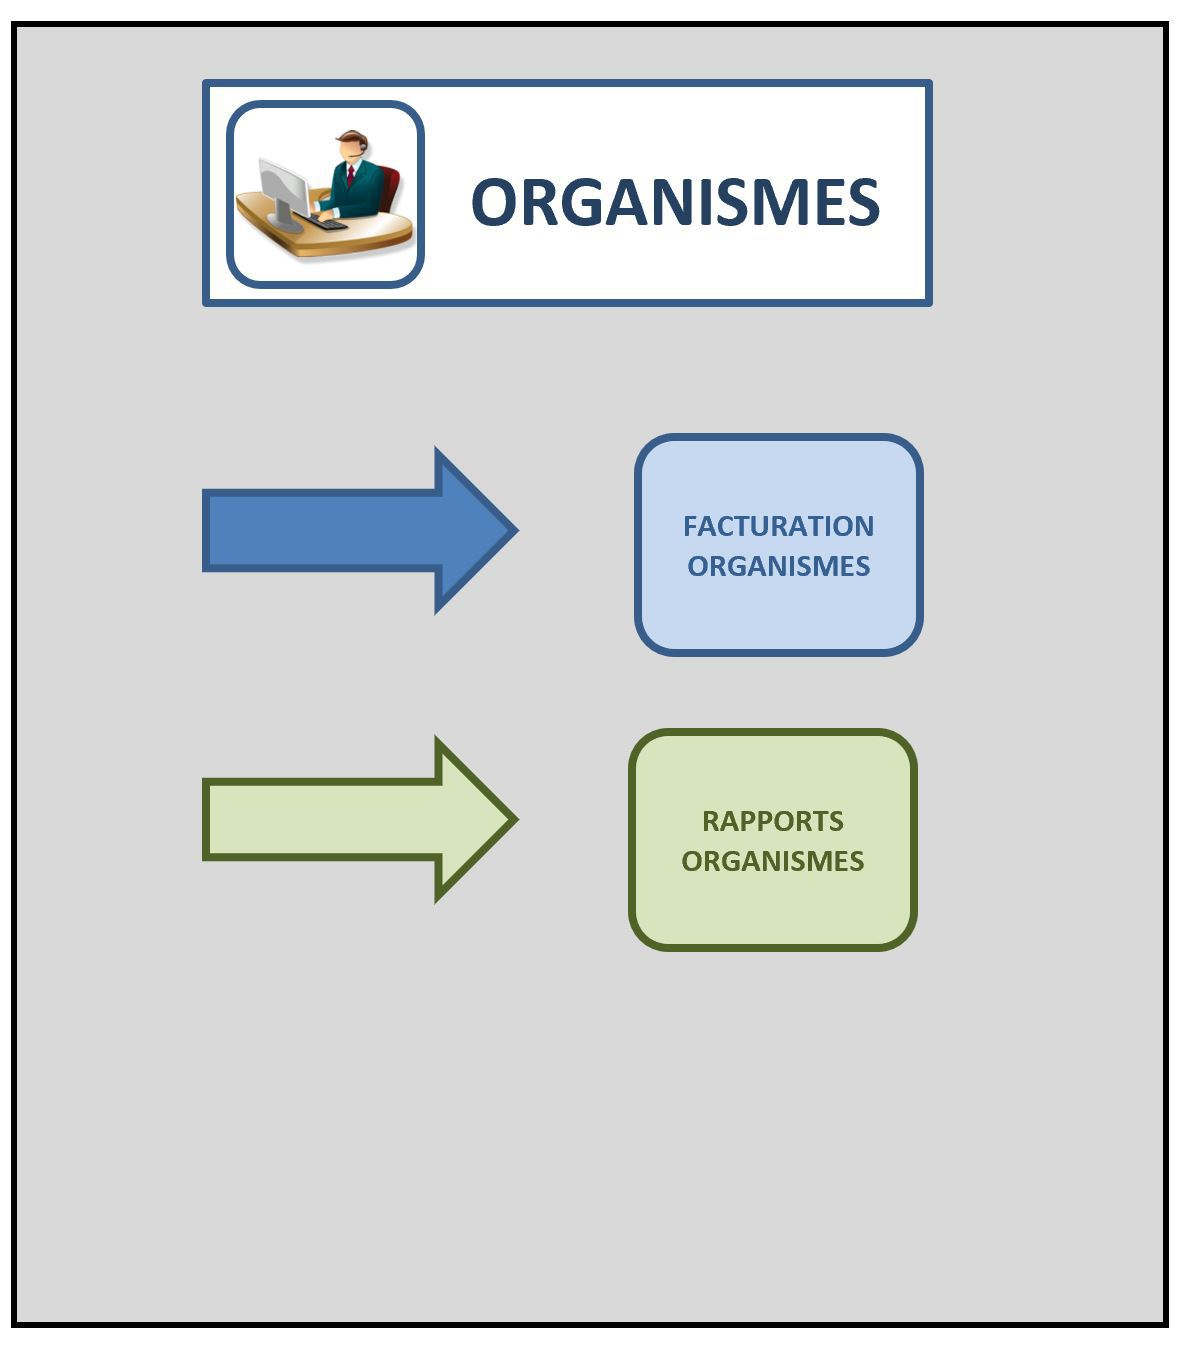 Organismes